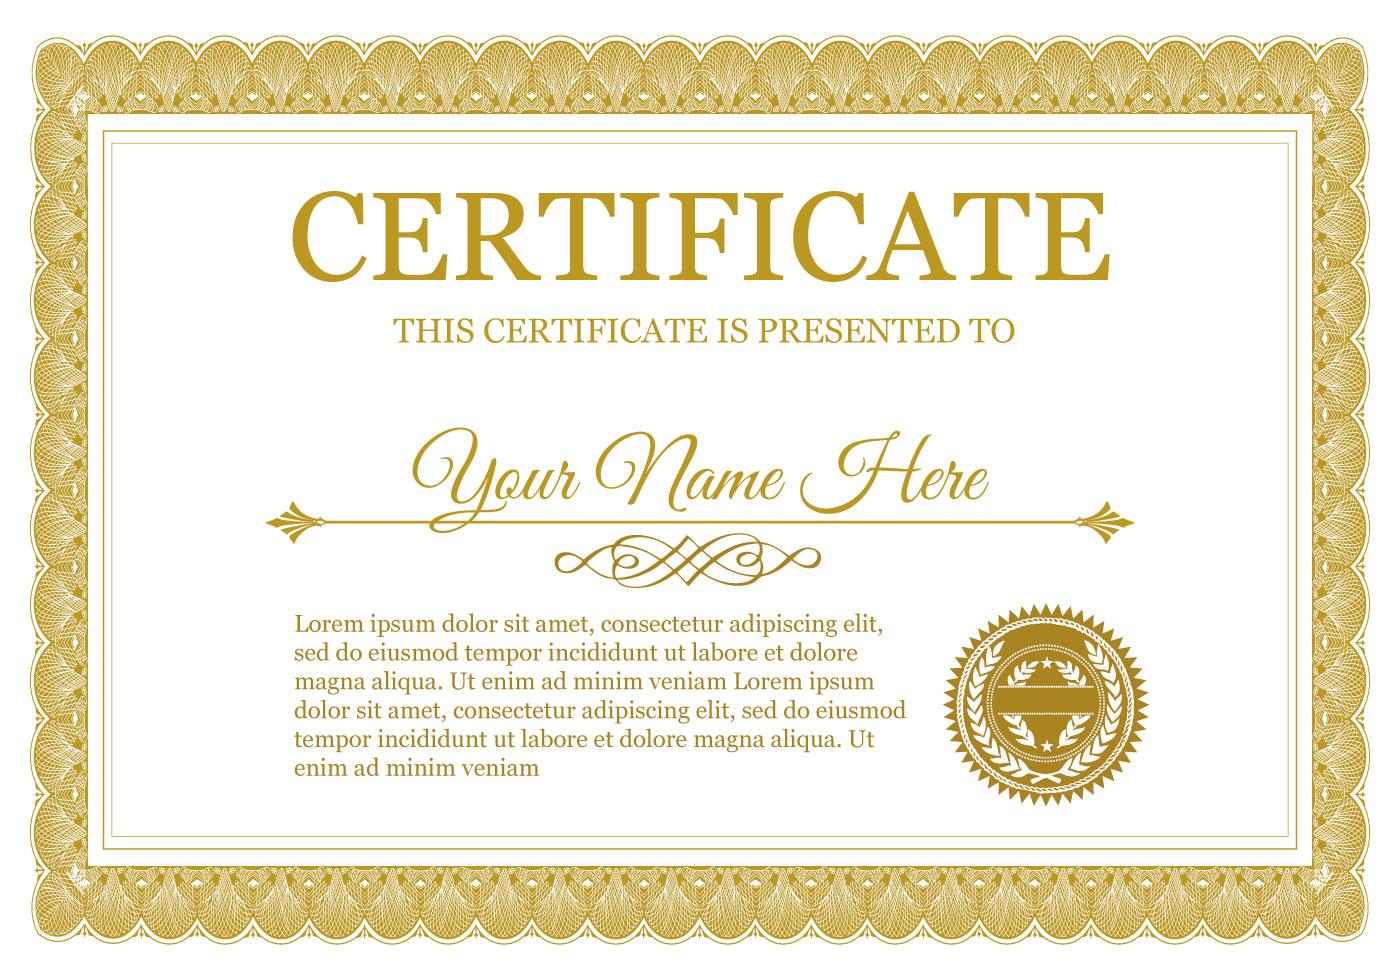 Download Template Certificate Word  Bisatuh with Awesome Certificate Templates For Word Free Downloads